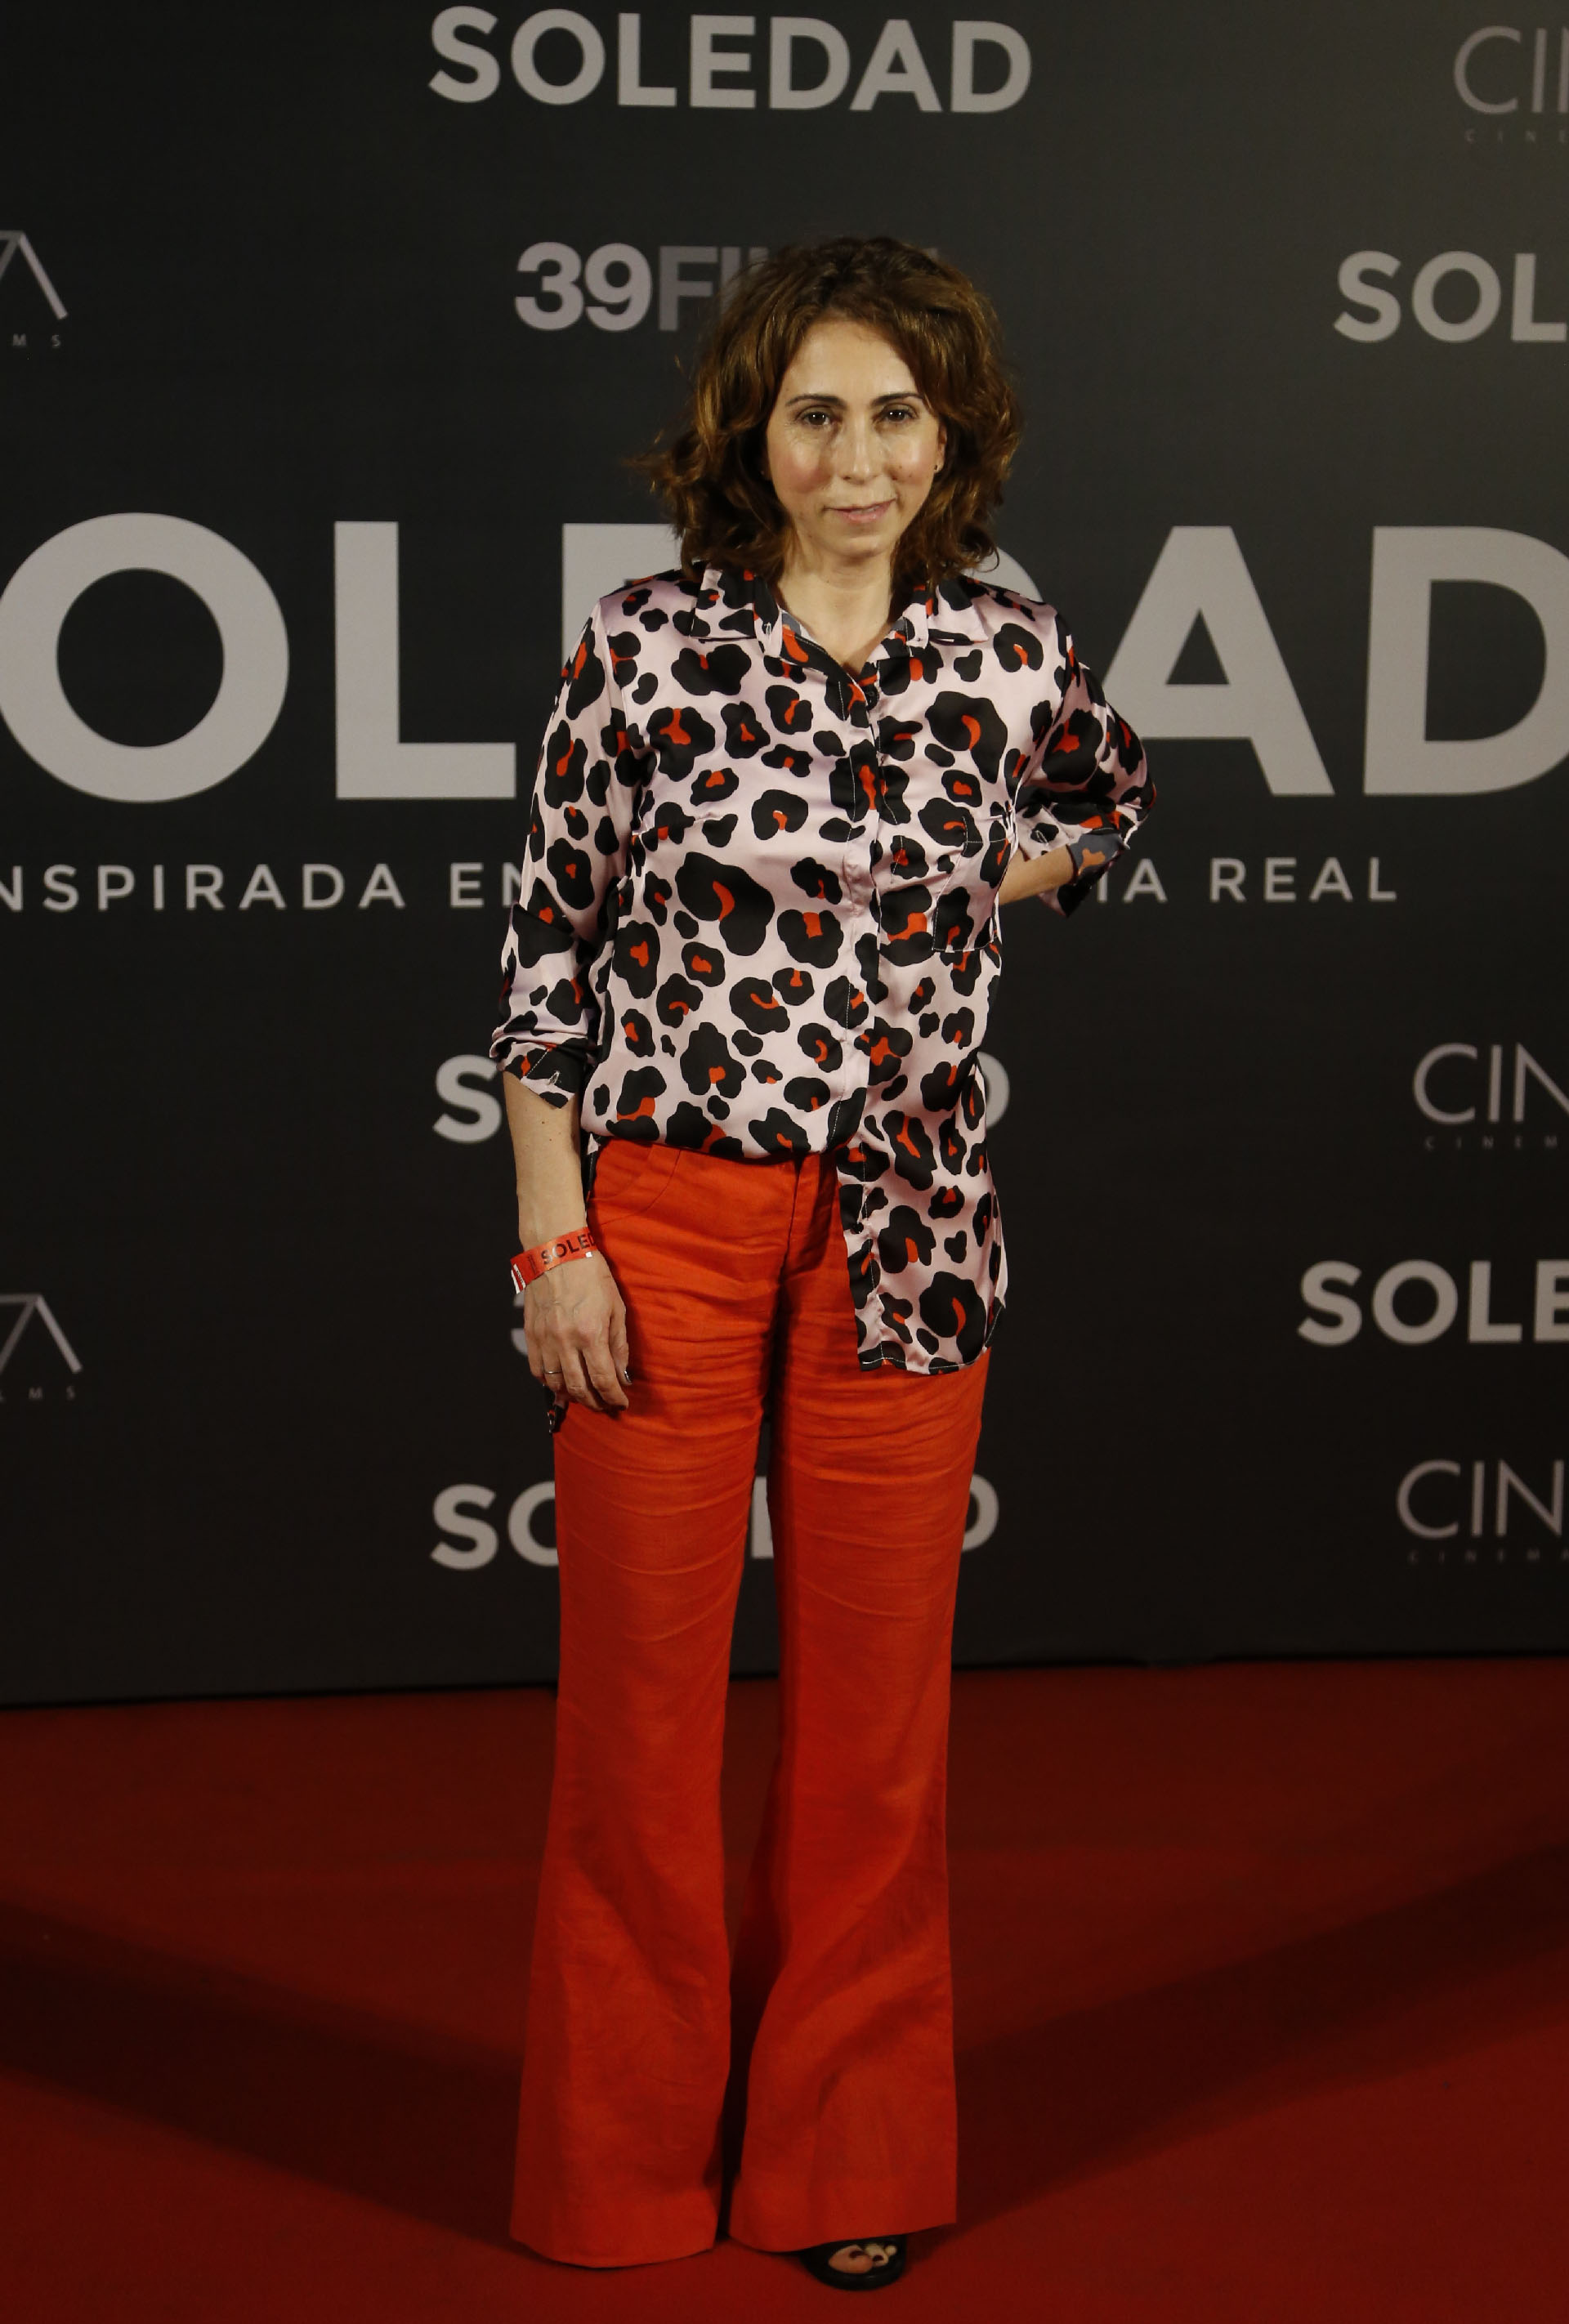 Fabiana García Lago